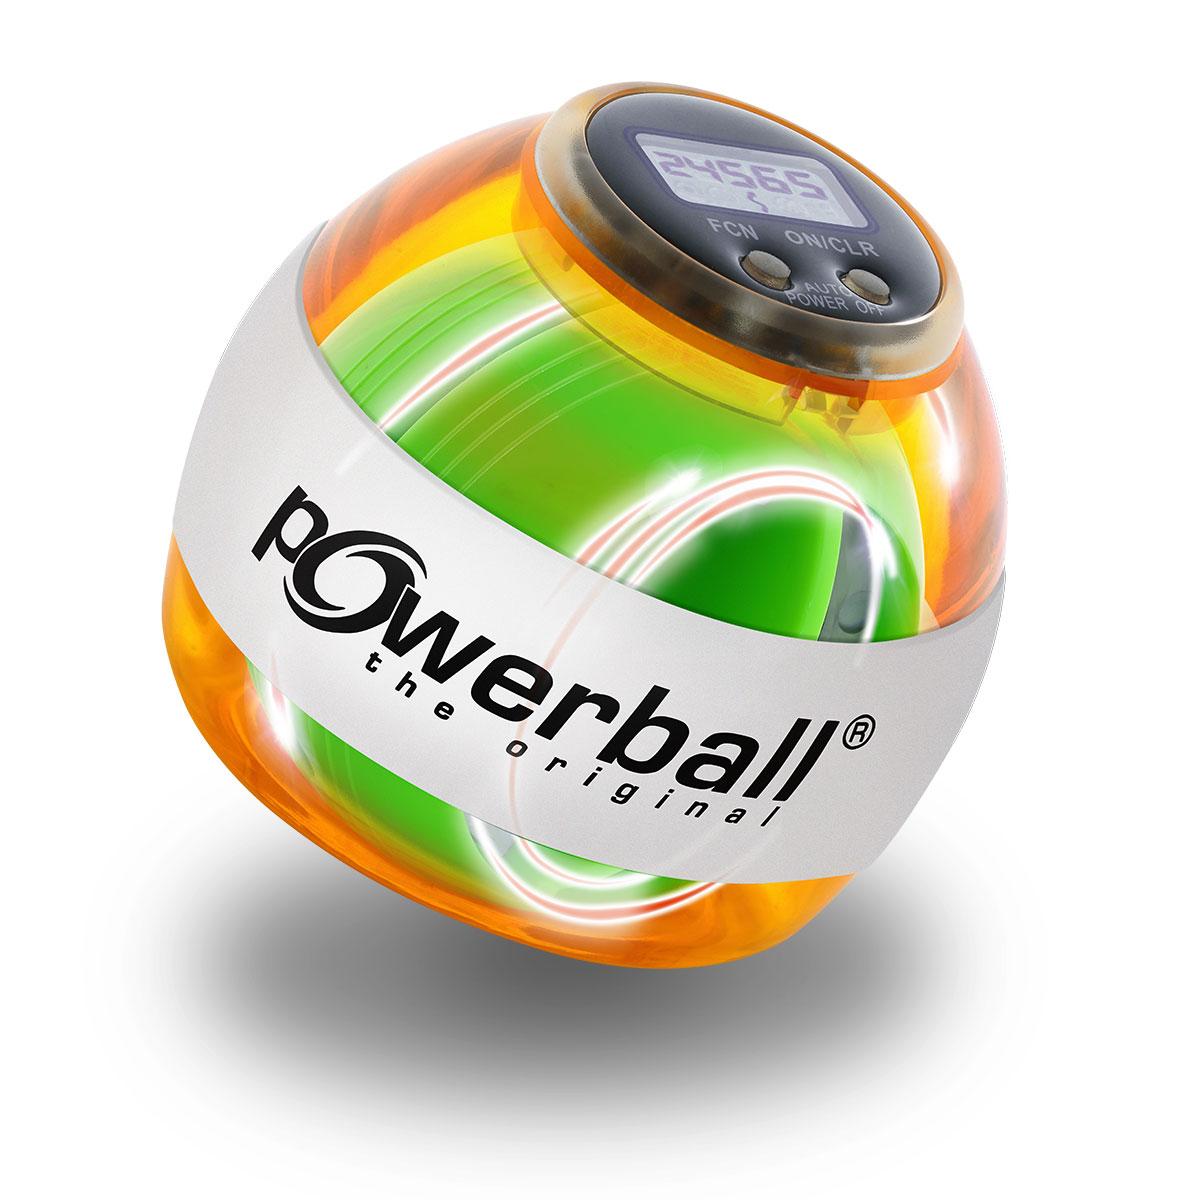 Original Powerball Max Red gekippt